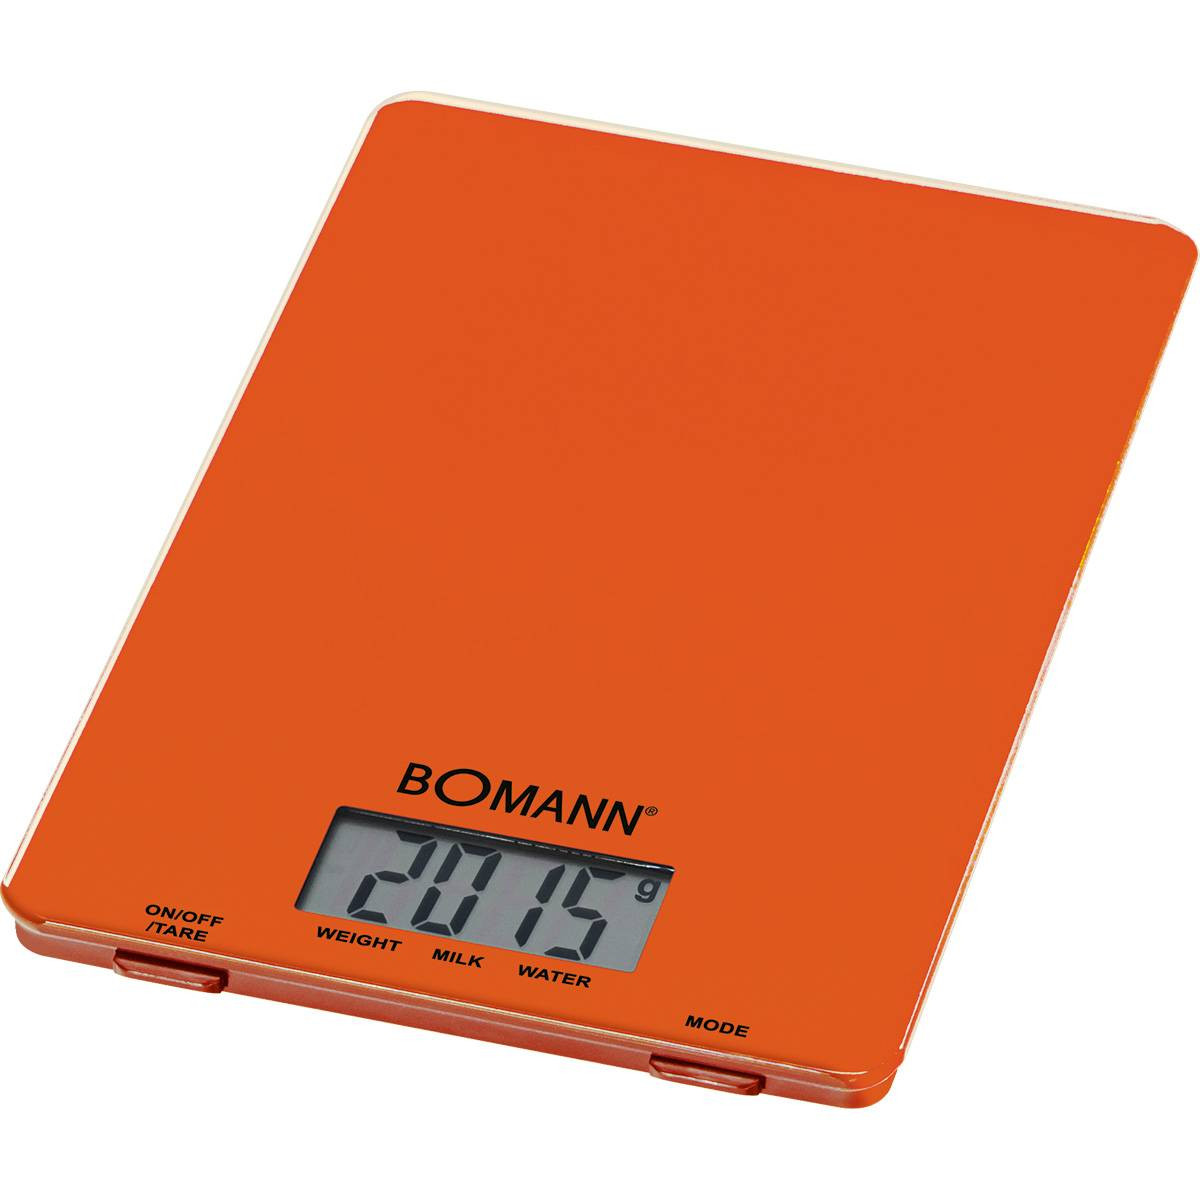 Bomann Balanza Digital KW 1515 naranja